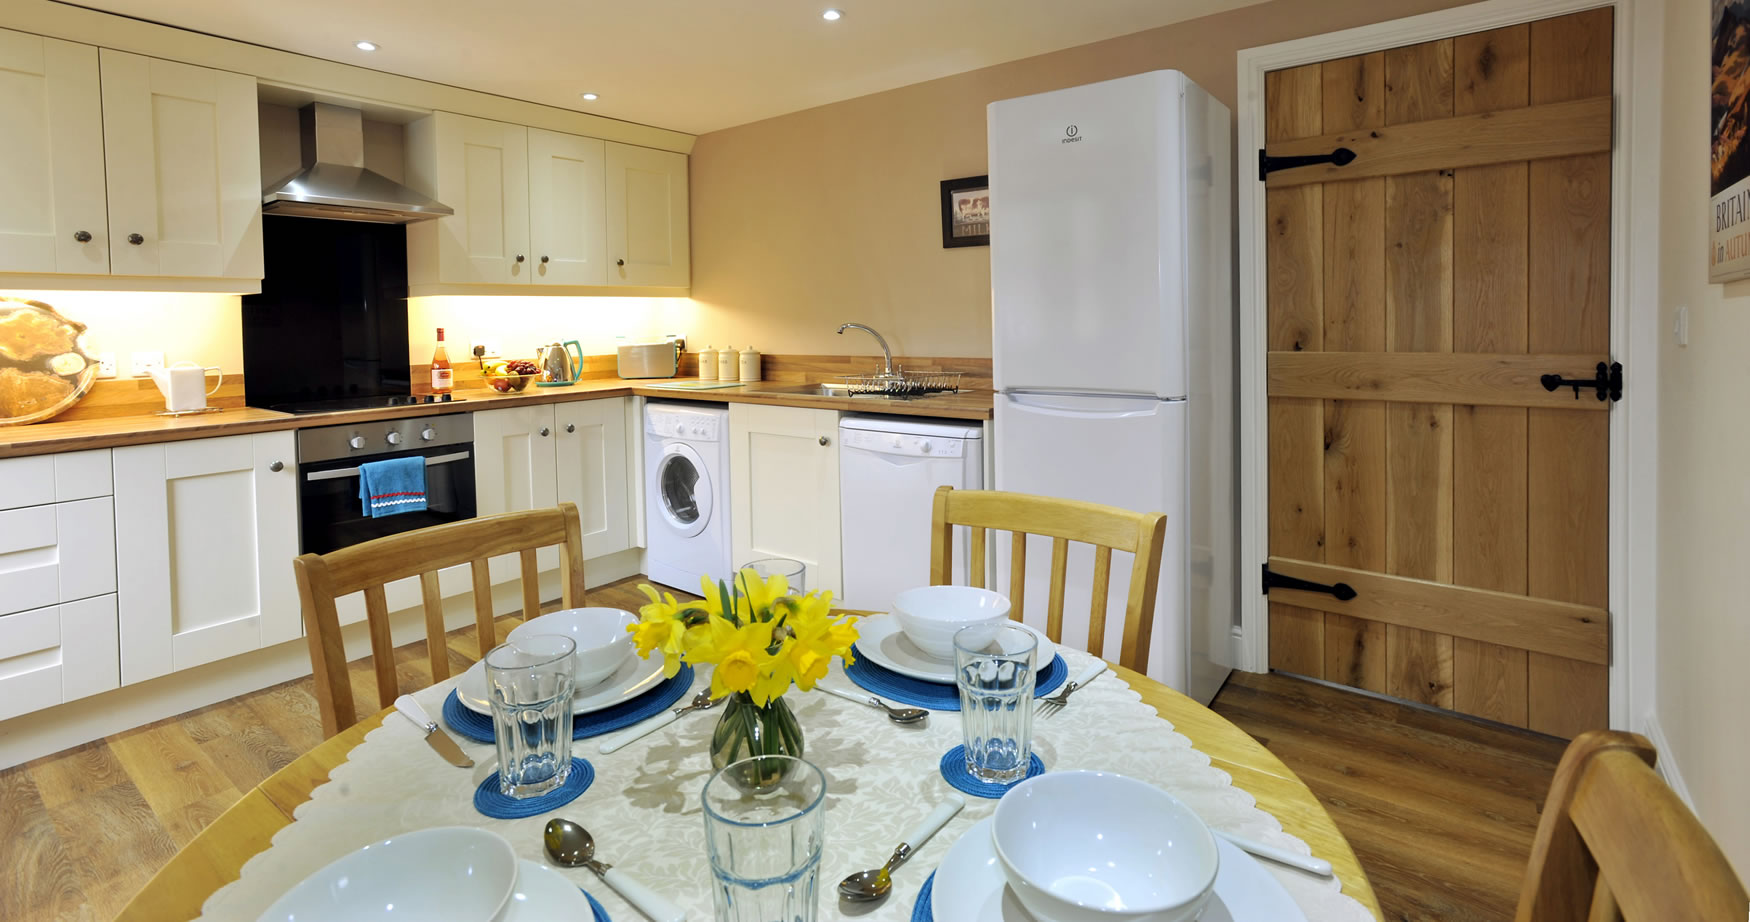 oldbothycottage-kitchen-dining